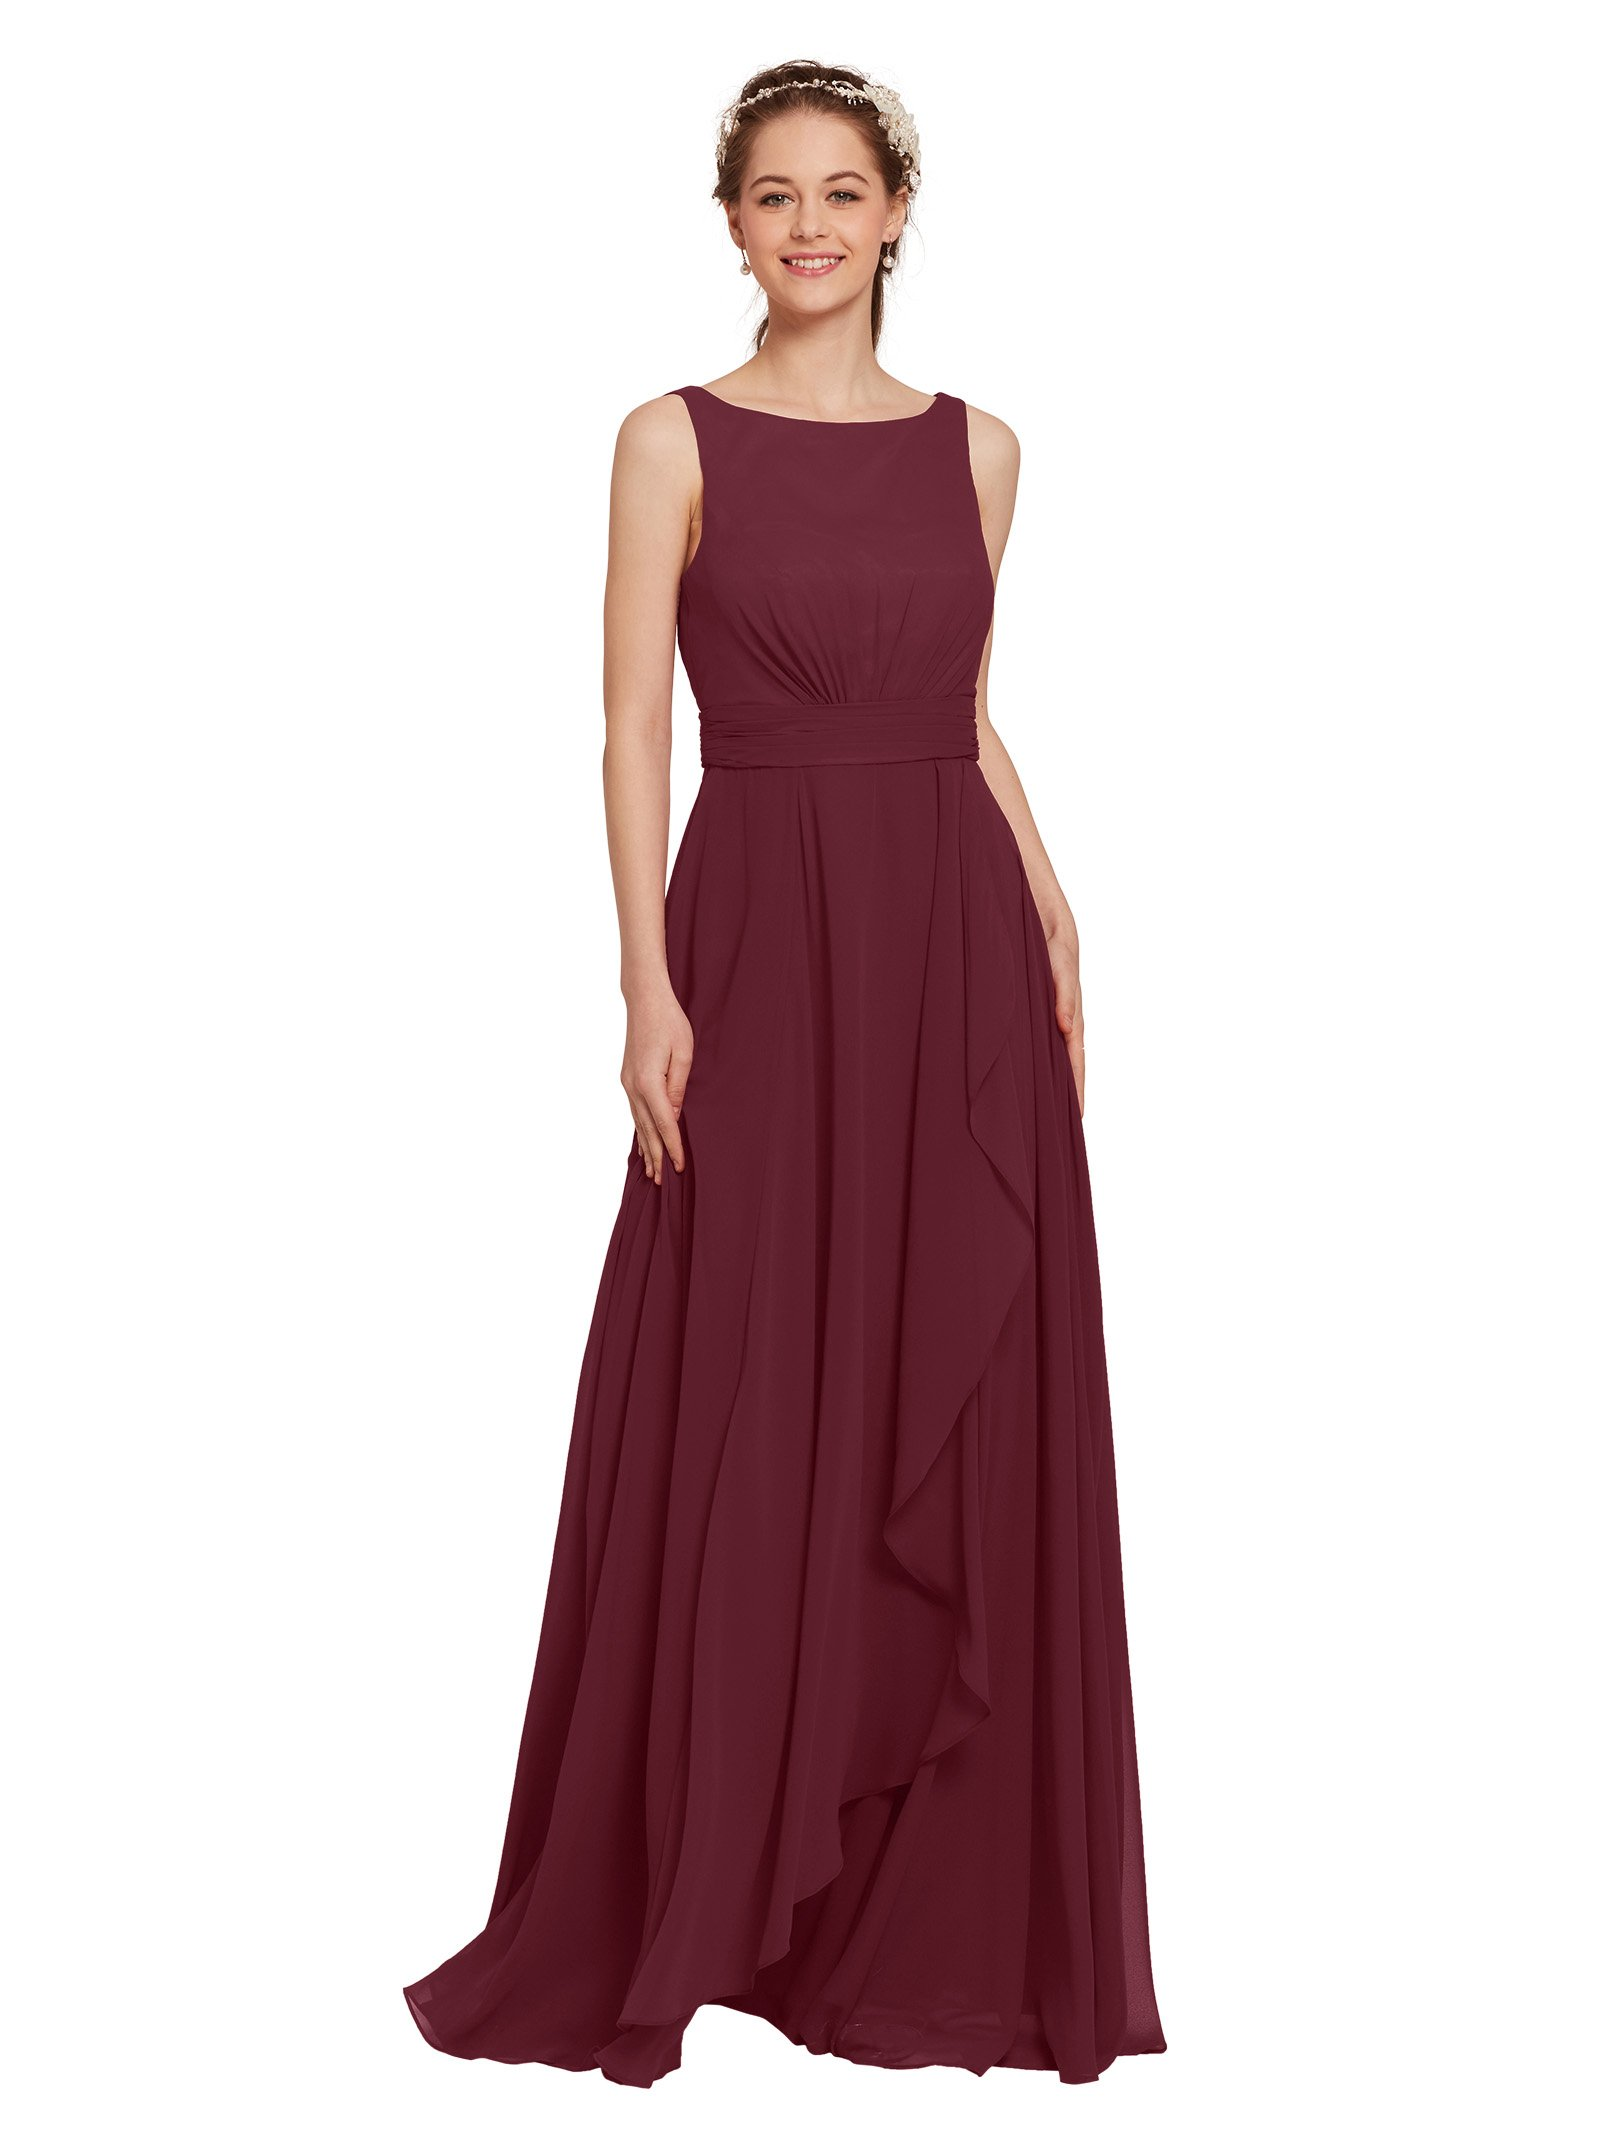 Modest Long Burgundy Bridesmaid Dress: Amazon.com